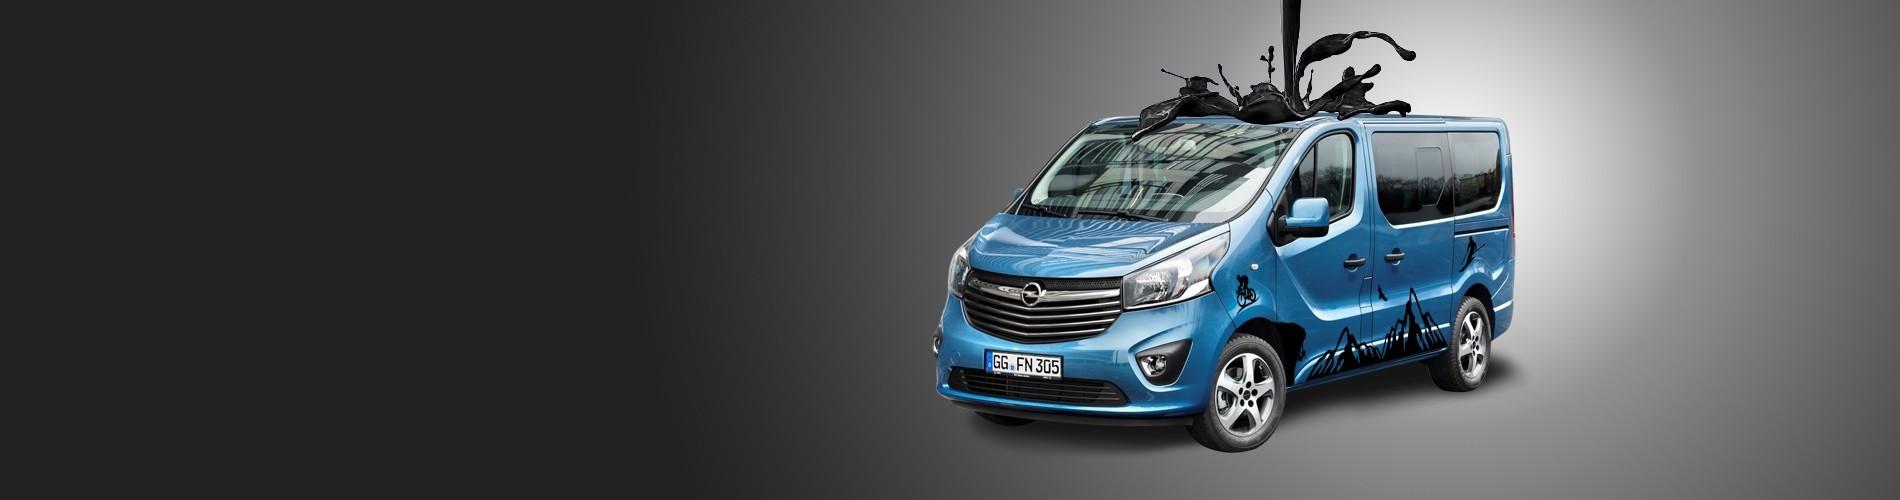 Ma Belle Voiture - Stickers Déco Opel Vivaro